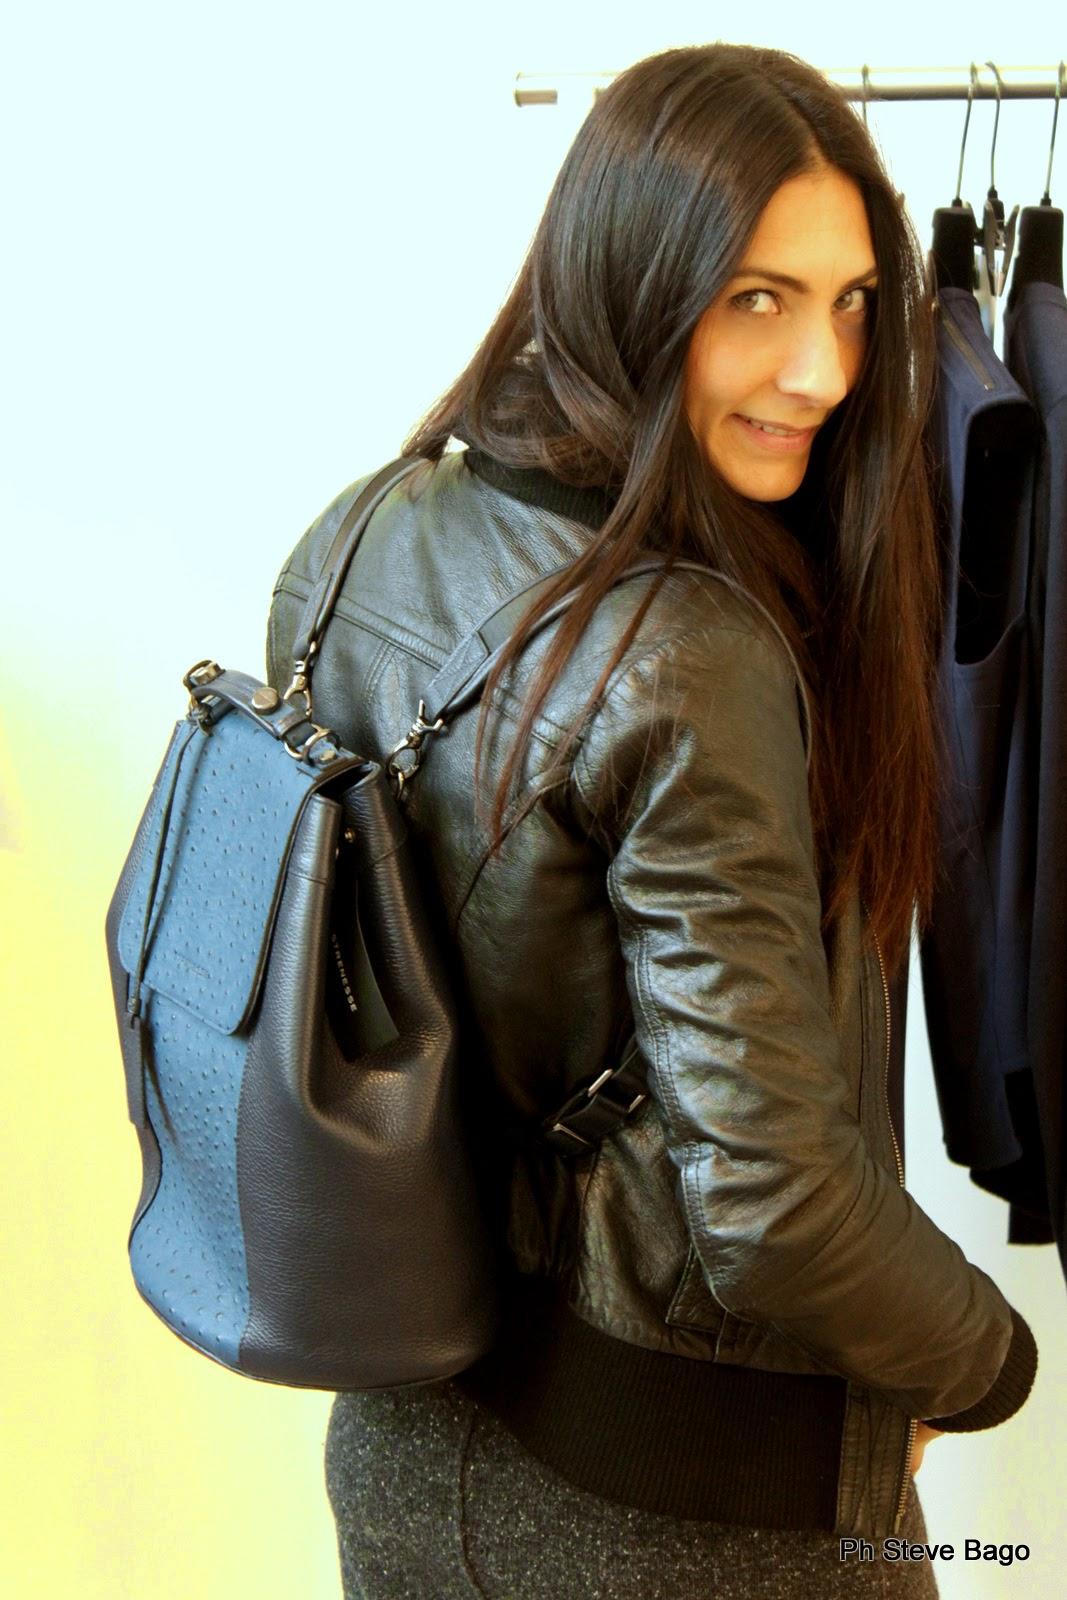 themorasmoothie, pressday, ss15, strenesse, fashion, fashionblog, fashionblogger, shoes, dress, look, outfit, blogger, italianblogger, girl, outfit, pics, bag, abiti, scarpe, borse, shoppingonline,